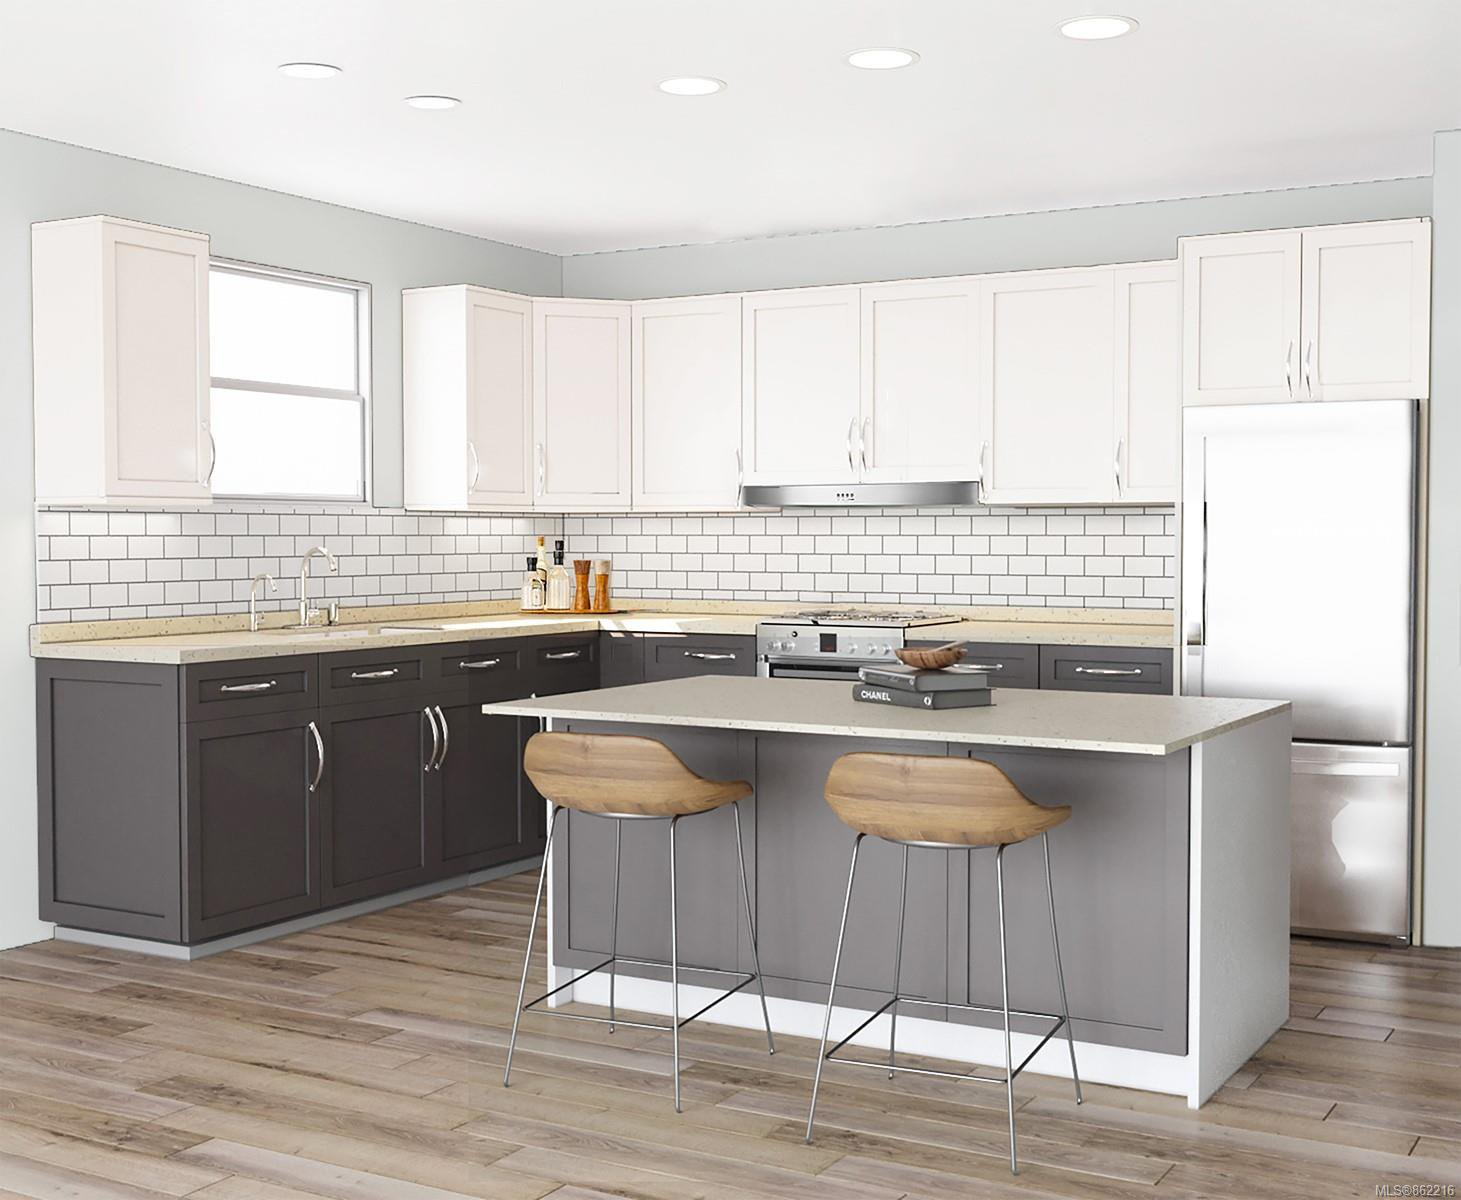 Main Photo: 129 1051 Shawnigan Lake Rd in : ML Shawnigan House for sale (Malahat & Area)  : MLS®# 862216